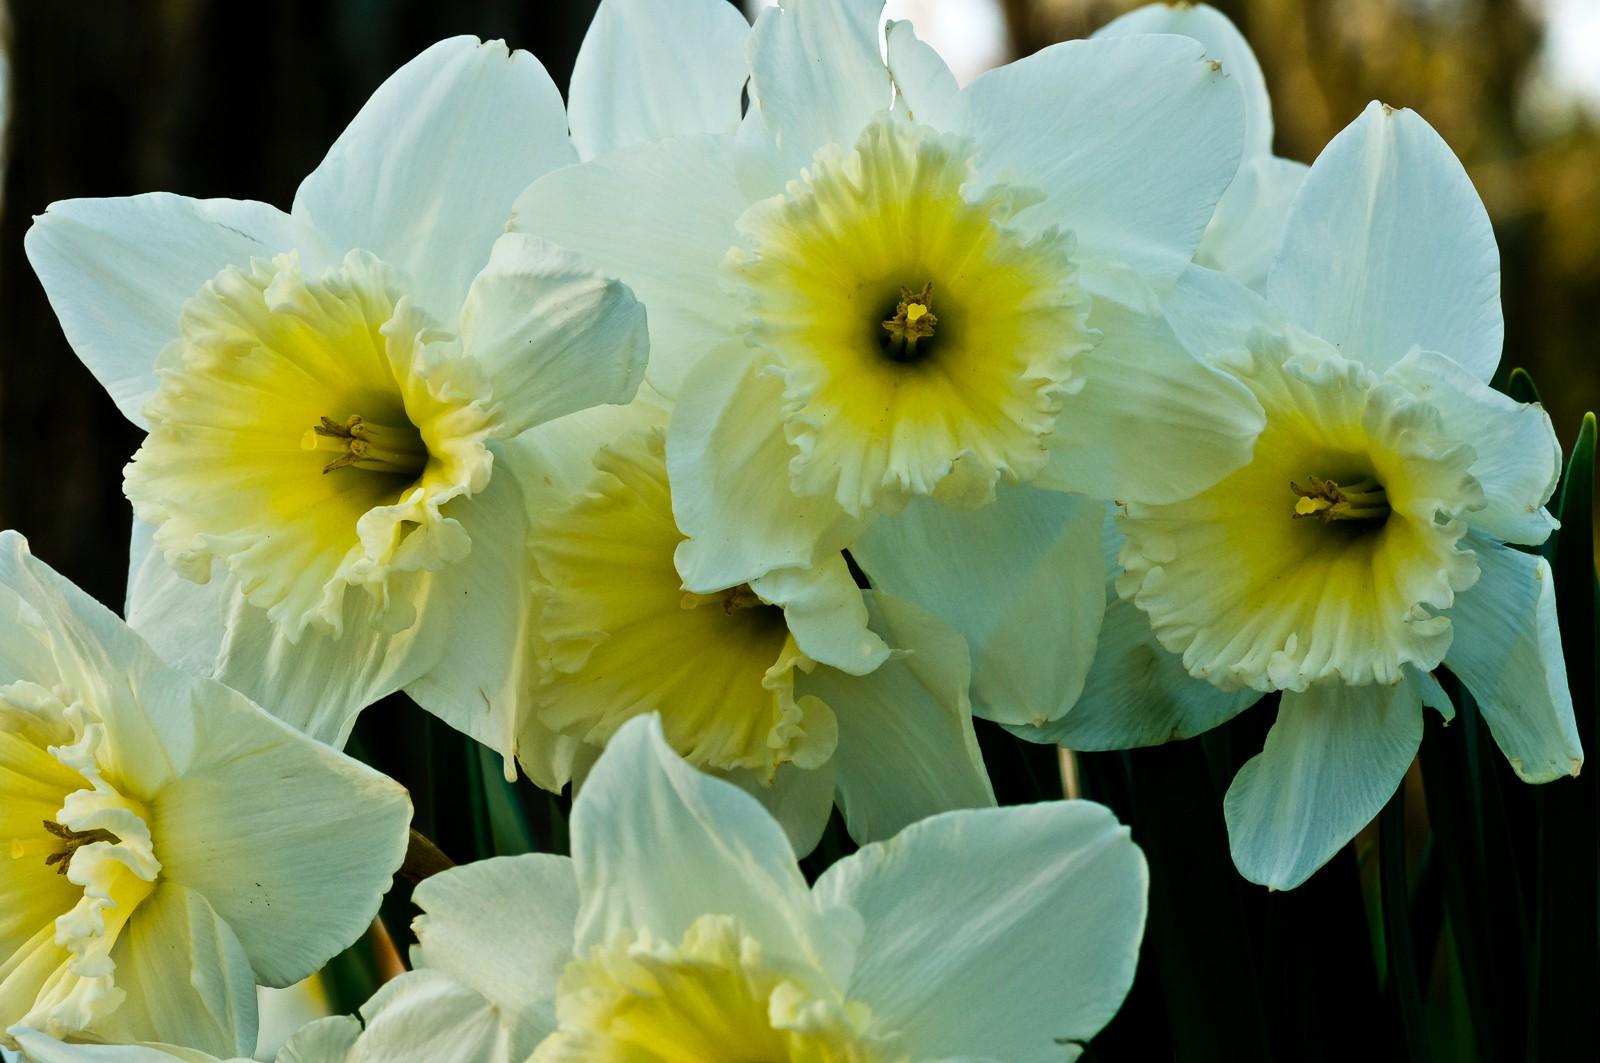 daffodils-6807